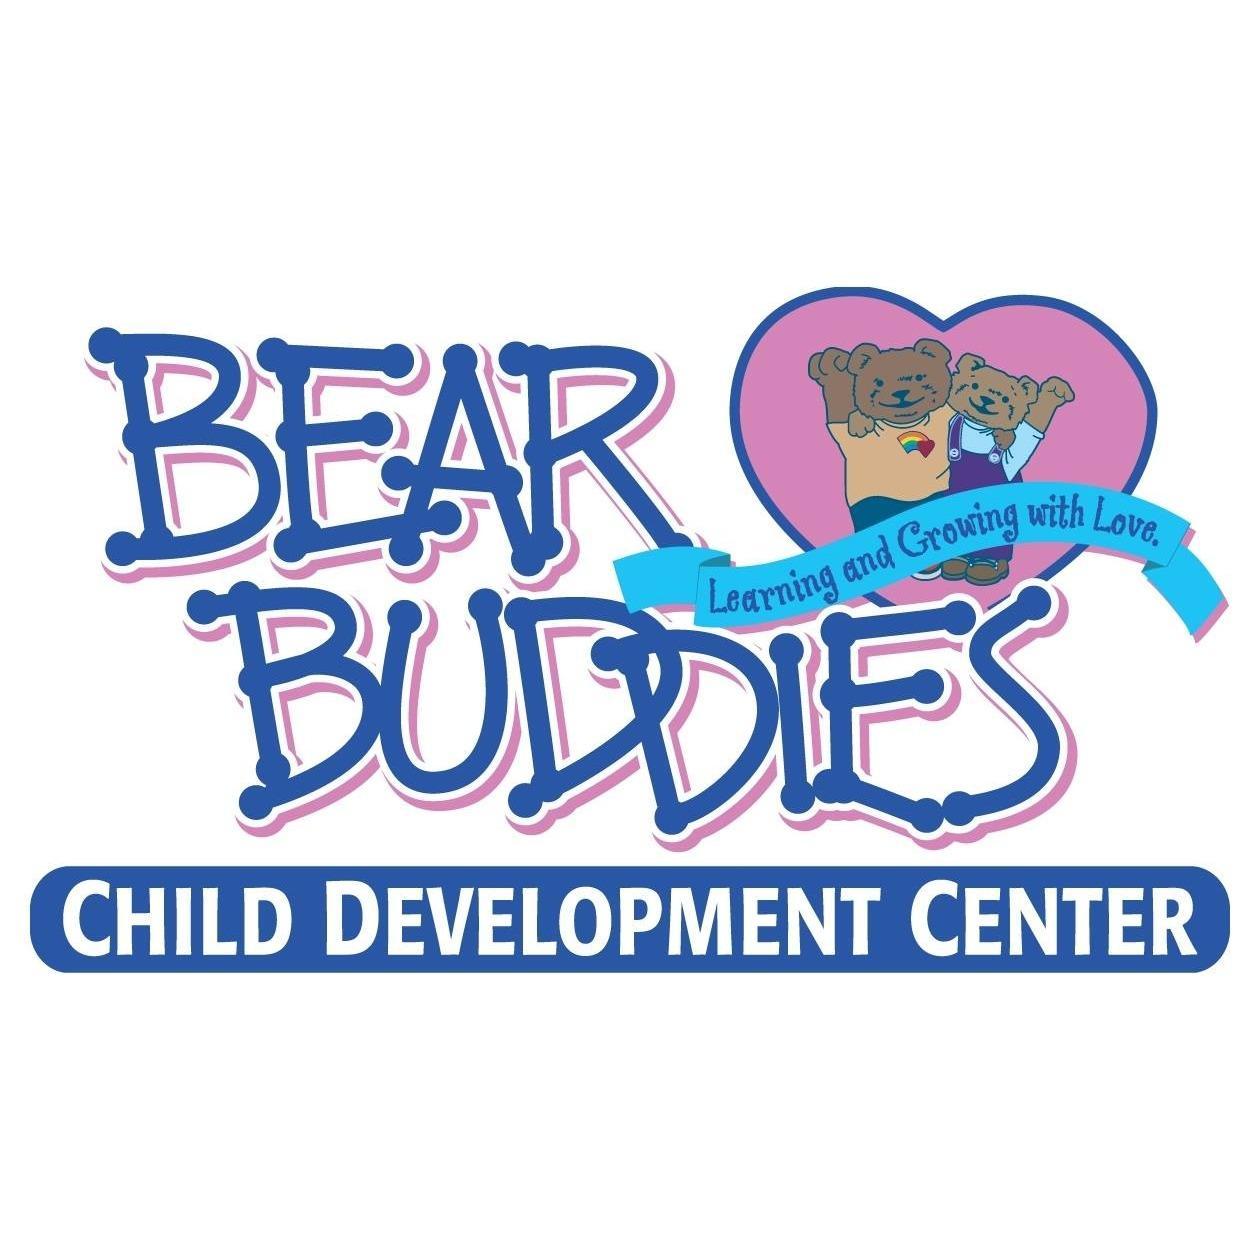 Bear Buddies Child Development Center